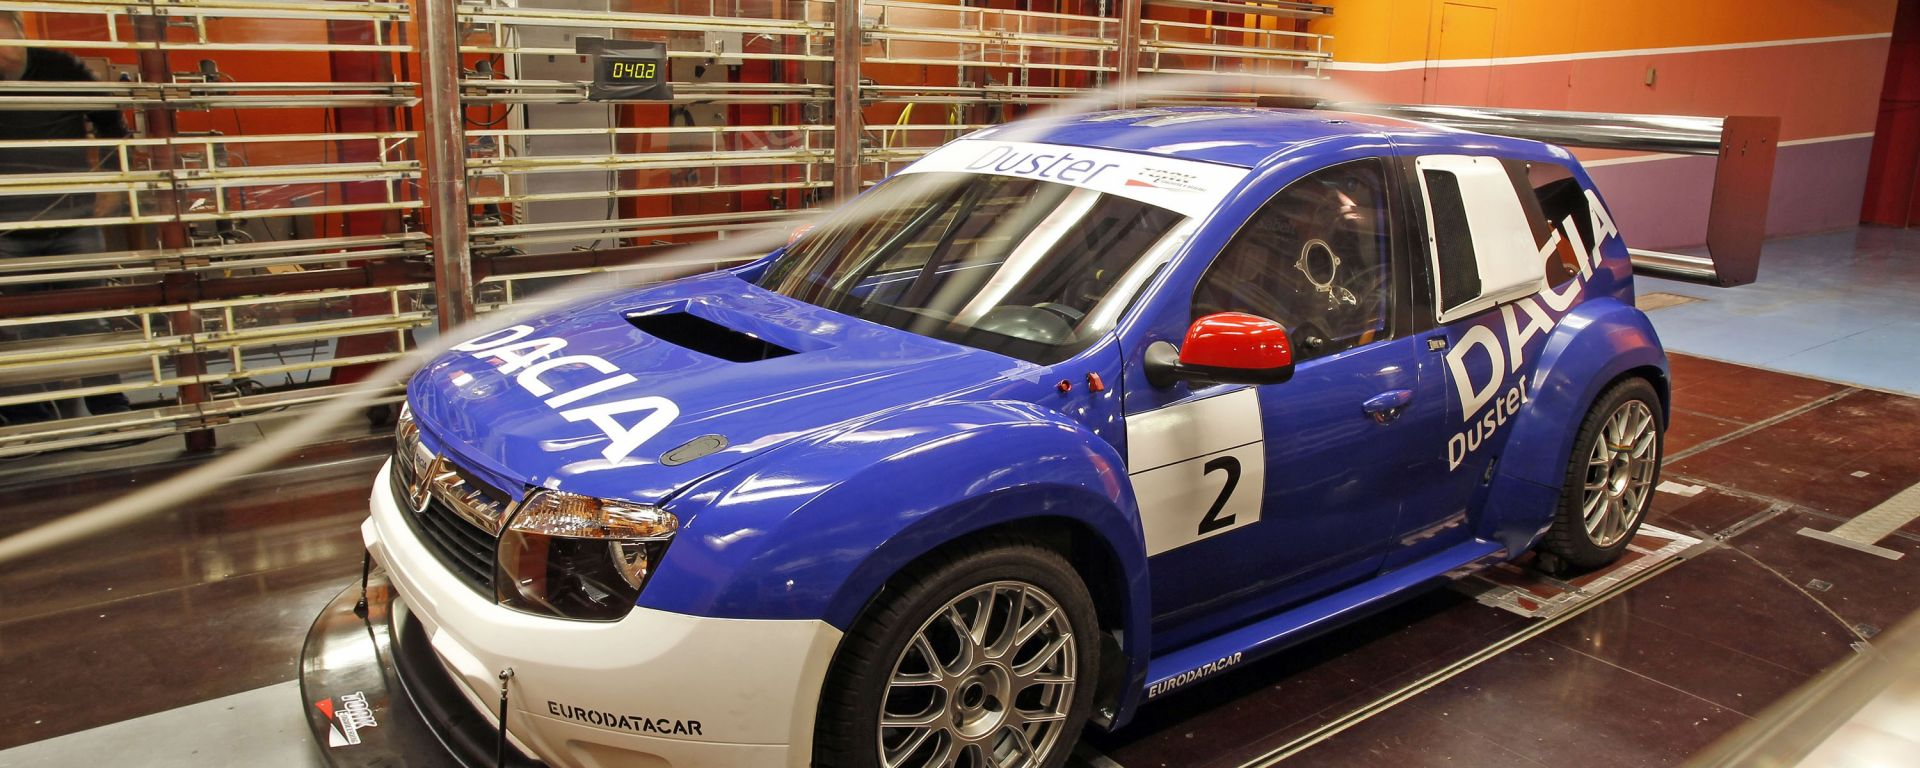 Dacia Duster No Limit: l'altra faccia del low-cost